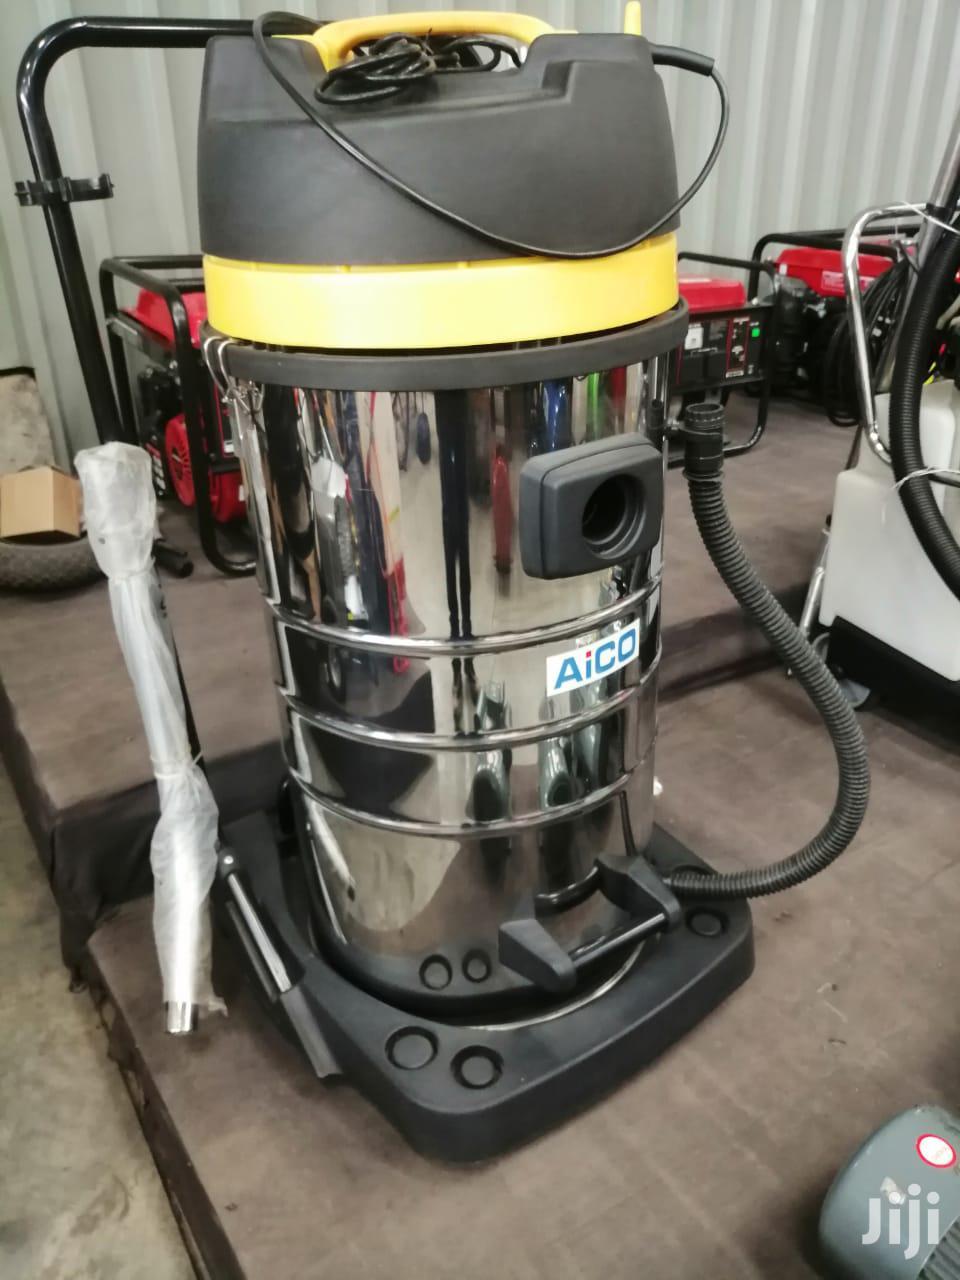 Brand New 100l Wet and Dry Vacuum Cleaner. | Home Appliances for sale in Imara Daima, Nairobi, Kenya